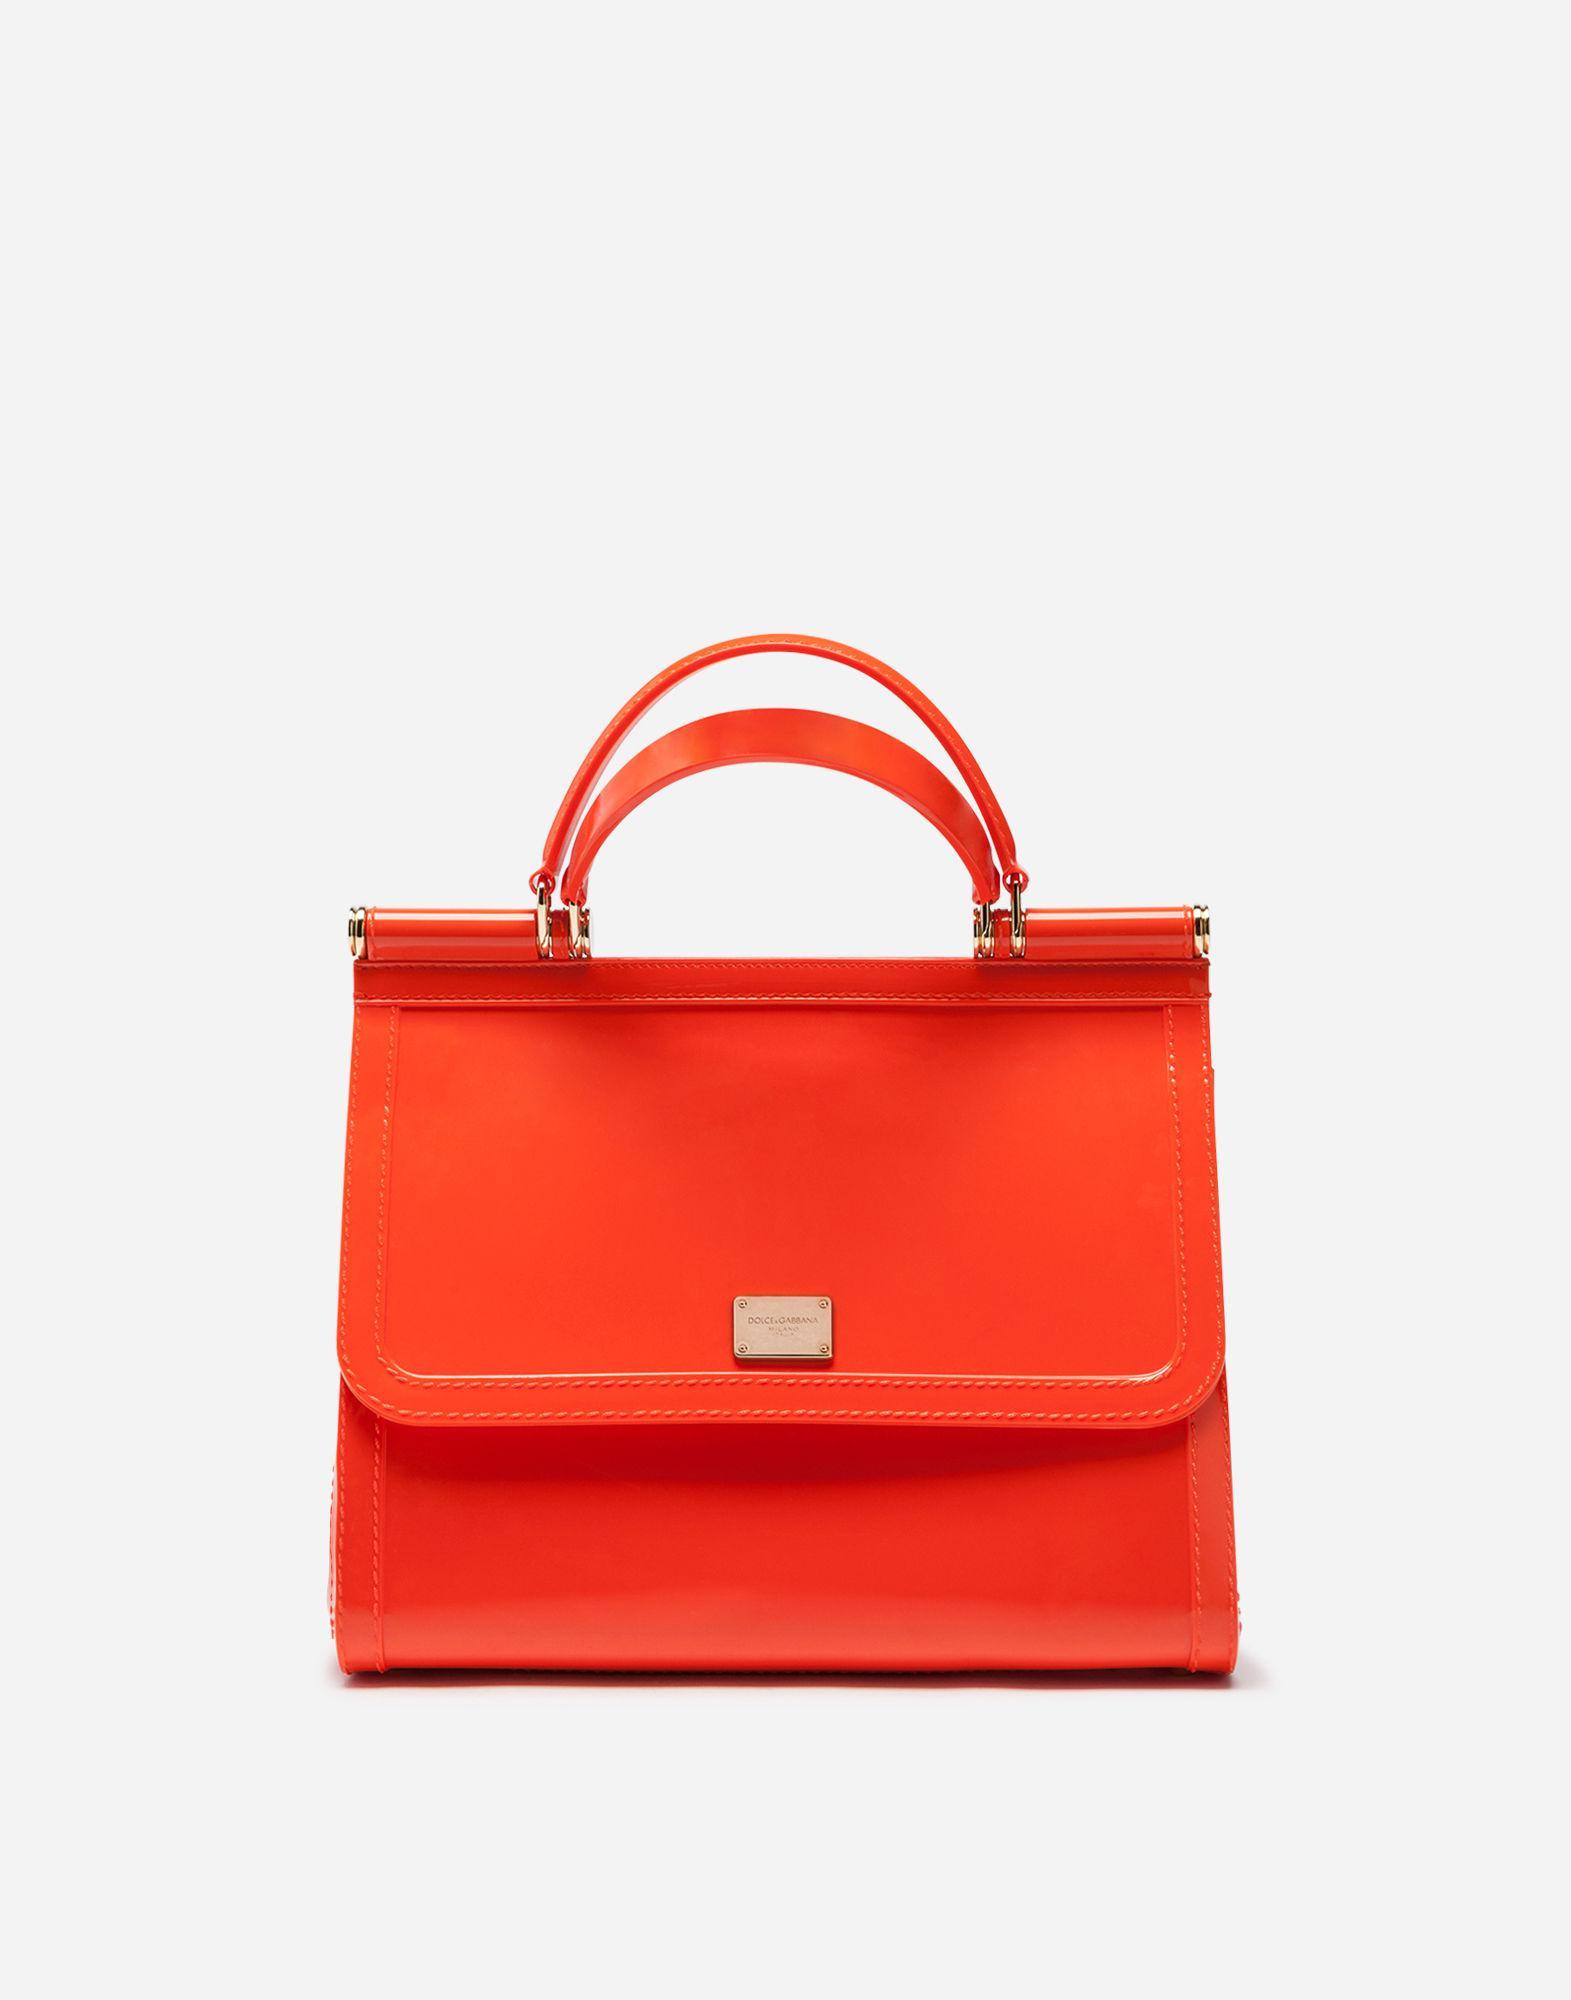 Lyst - Dolce   Gabbana Rubber Sicily Handbag in Orange 370b3cafaf102